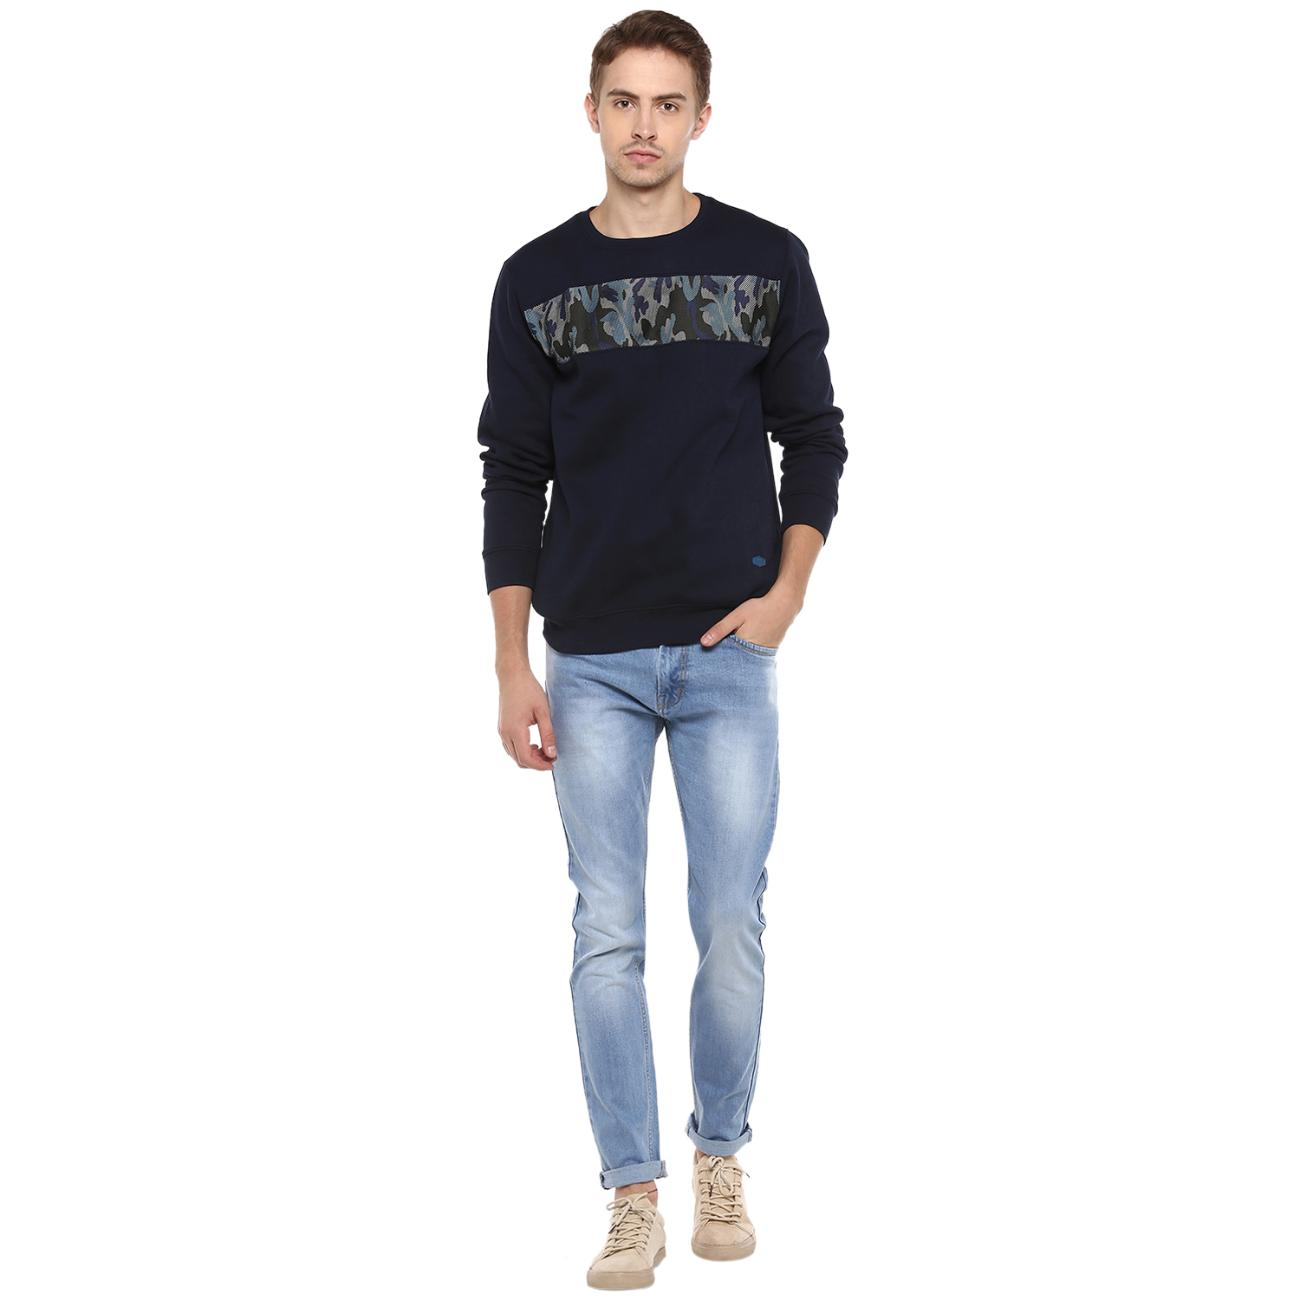 Buy Men's Navy Printed Sweater